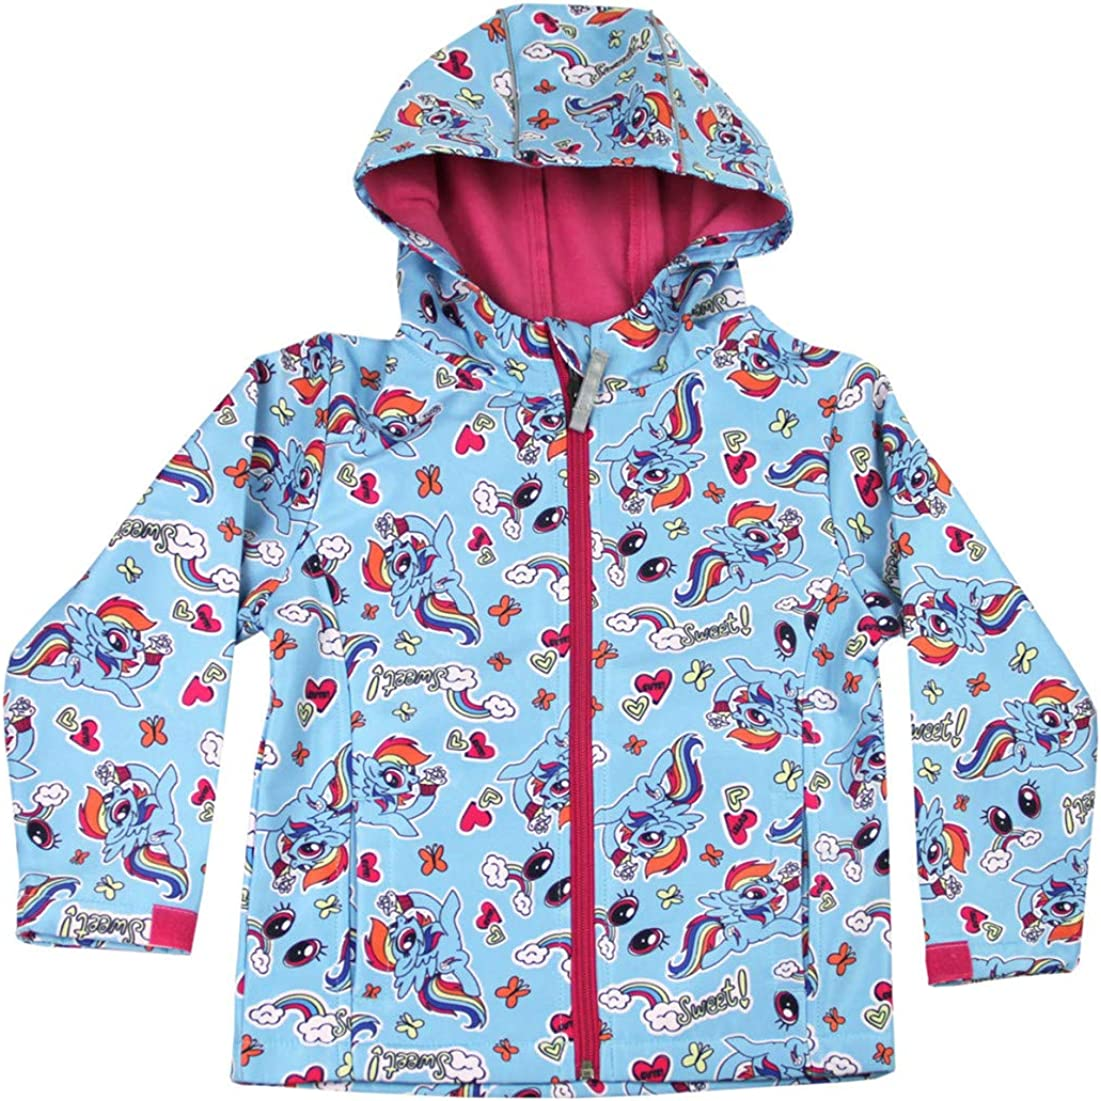 My Little Pony Hooded Jacket Kids Zipped Fleece Coat